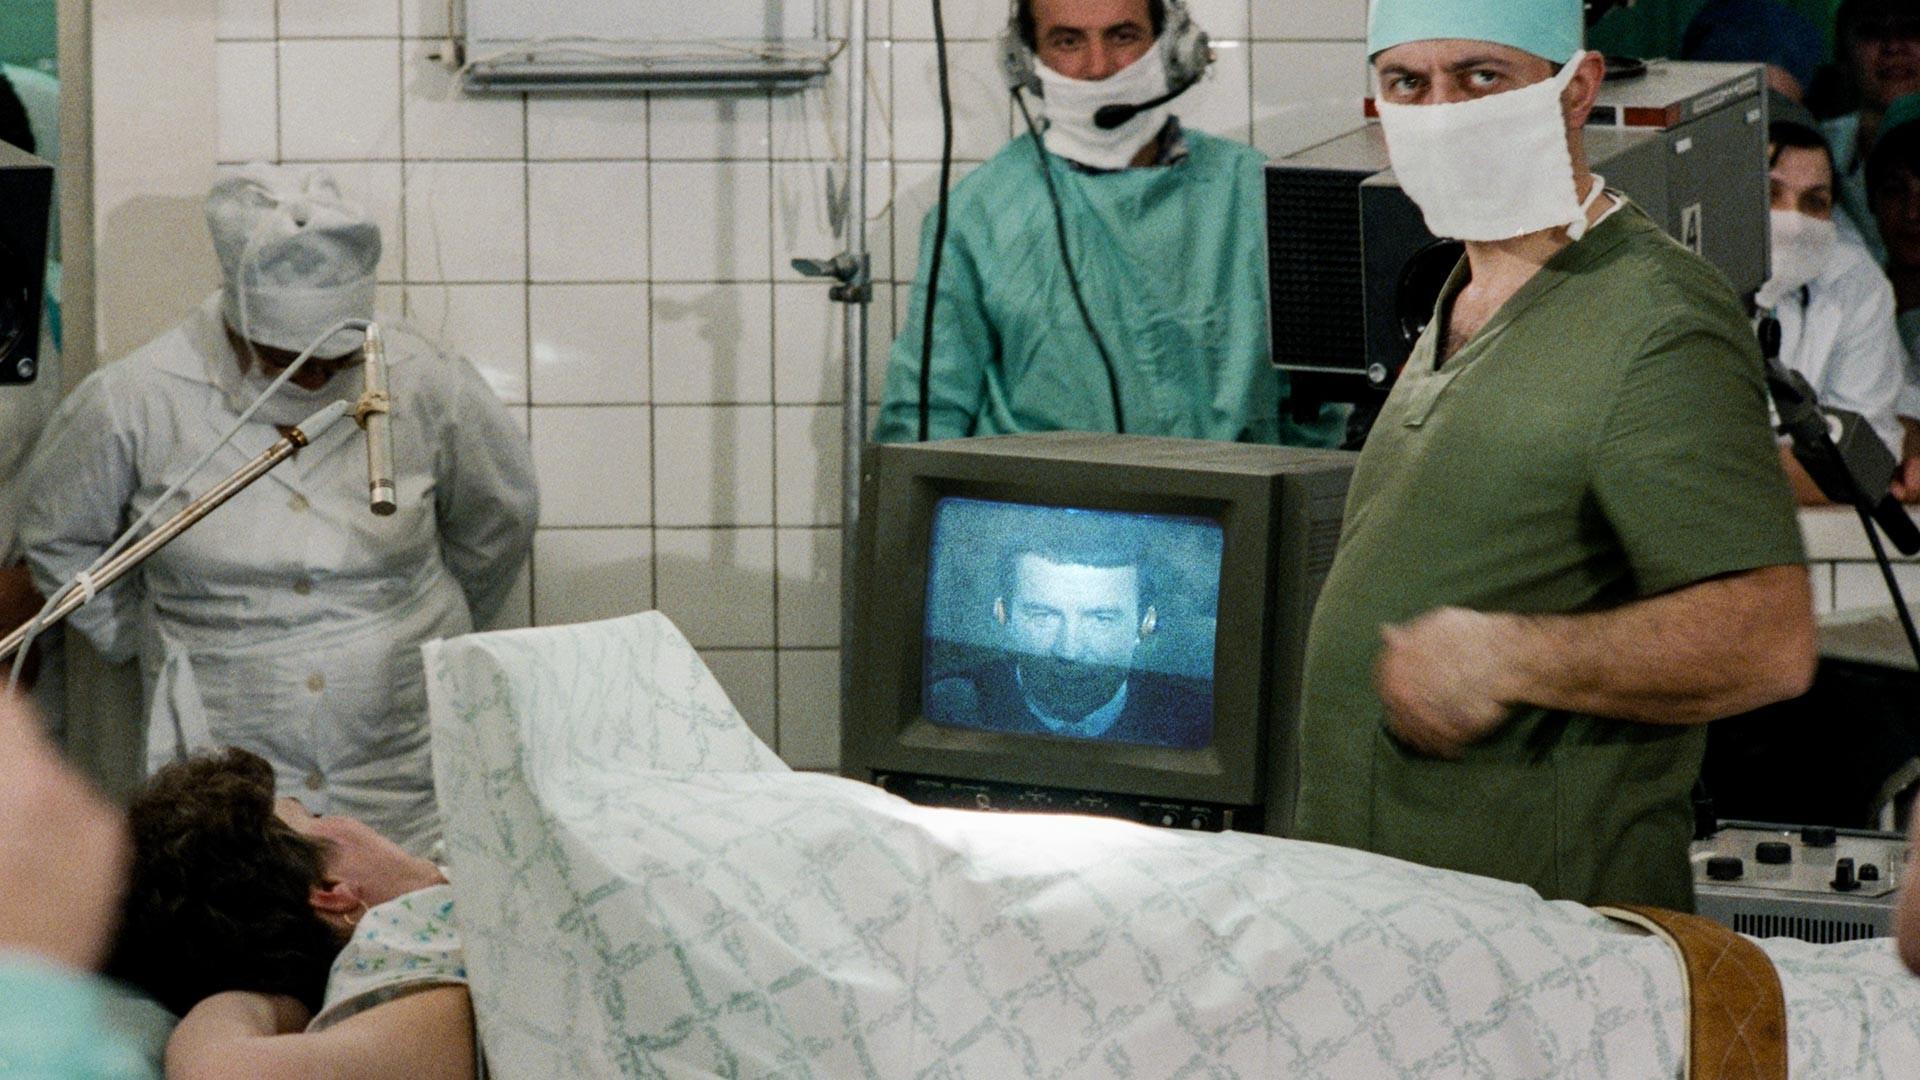 Обезболивание пациента дистанционно во время сеанса психотерапии.